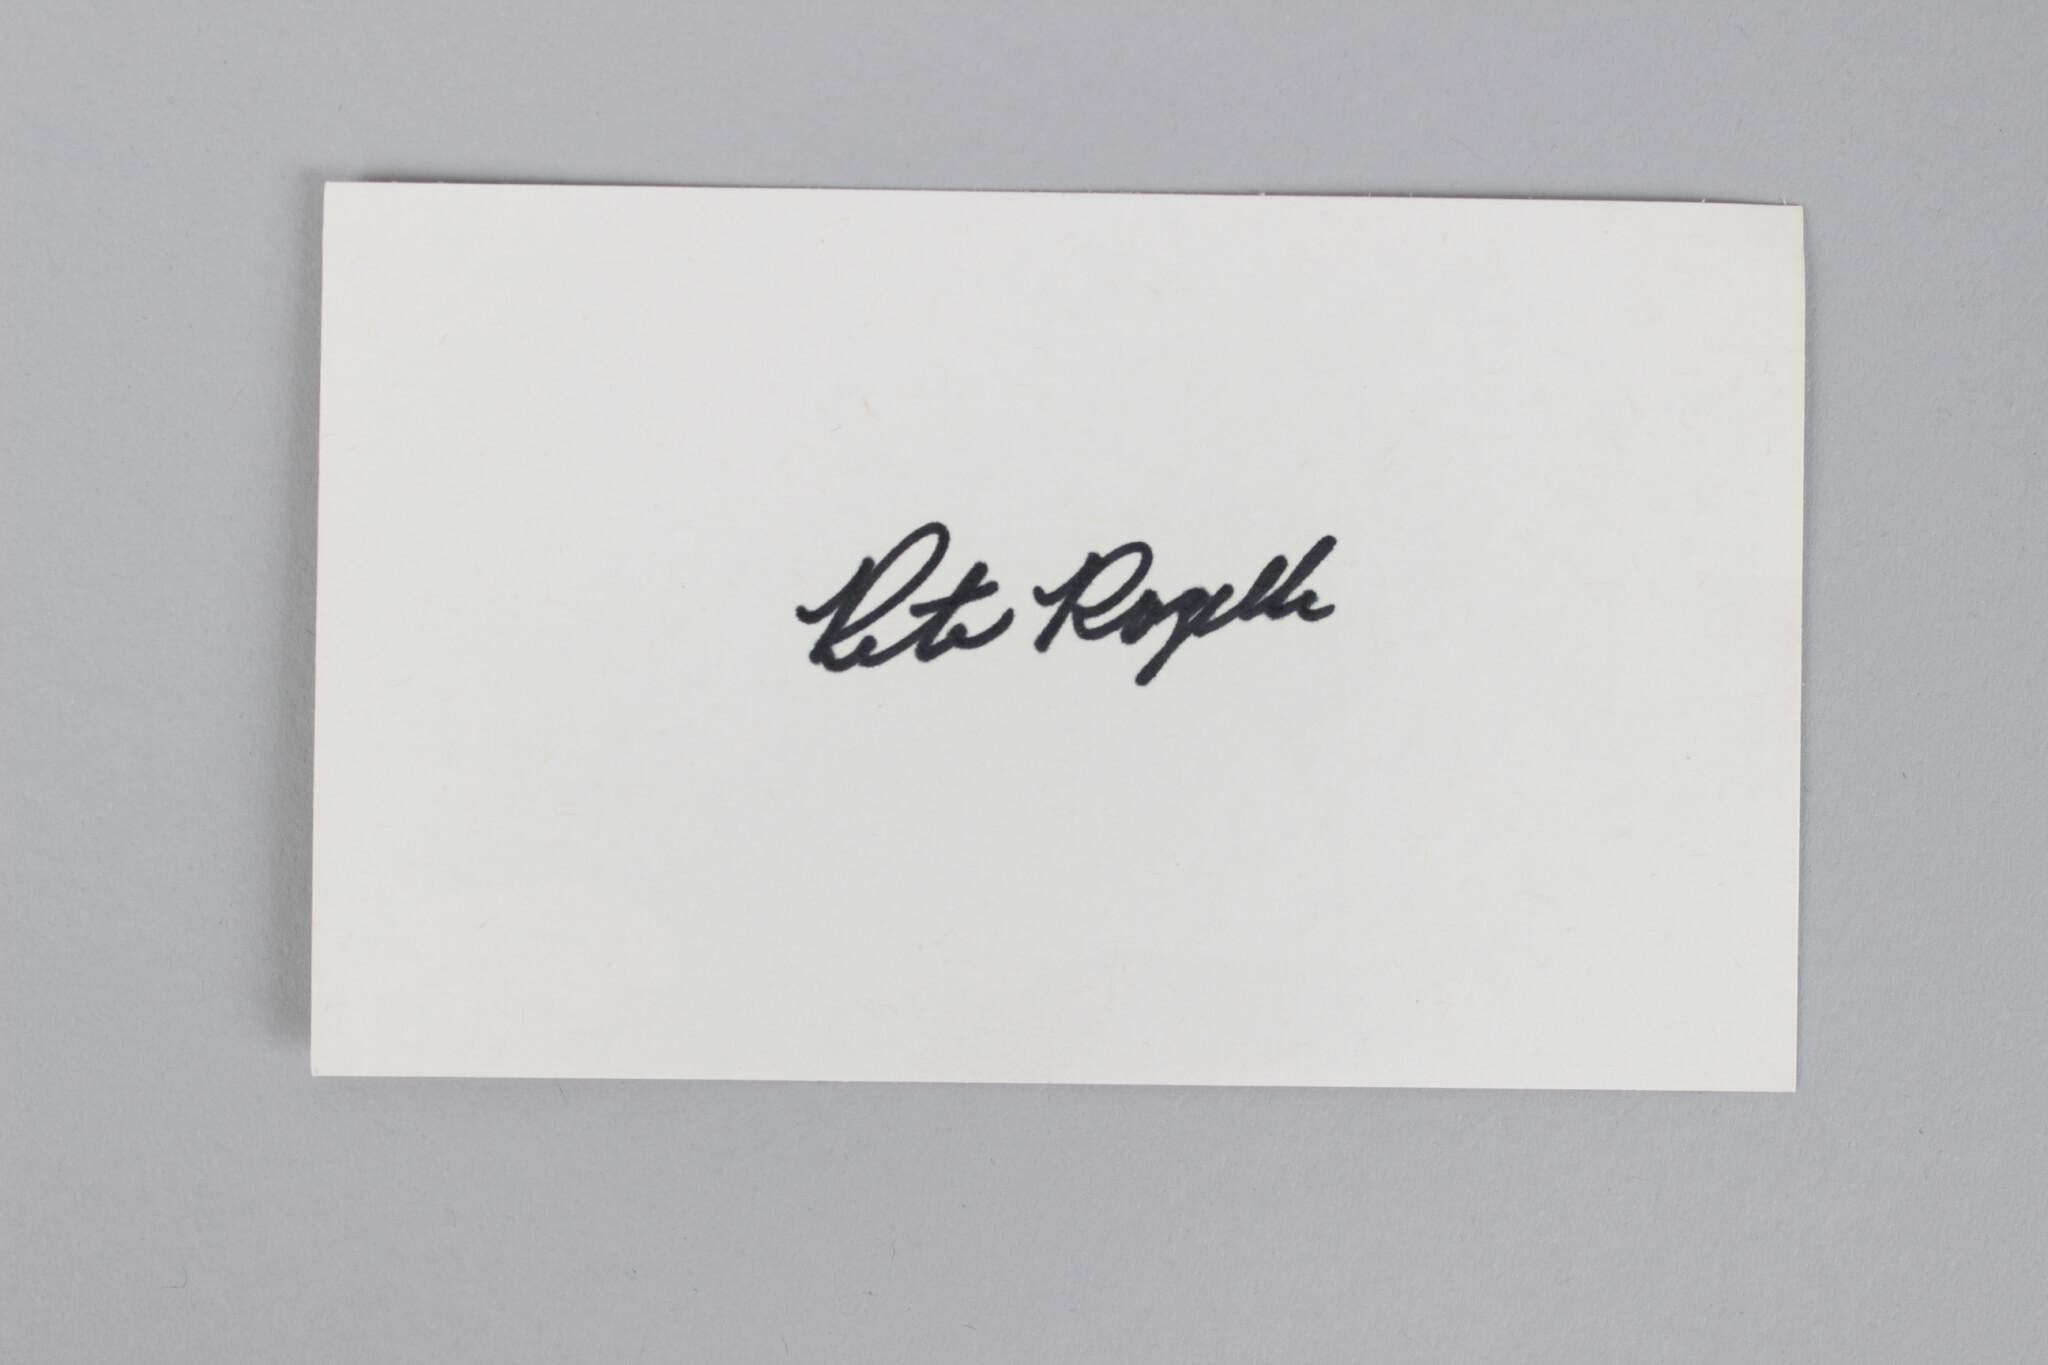 Pete Rozelle Signed Index Card NFL Commissioner COA JSA Certified NFL Cut Signatures